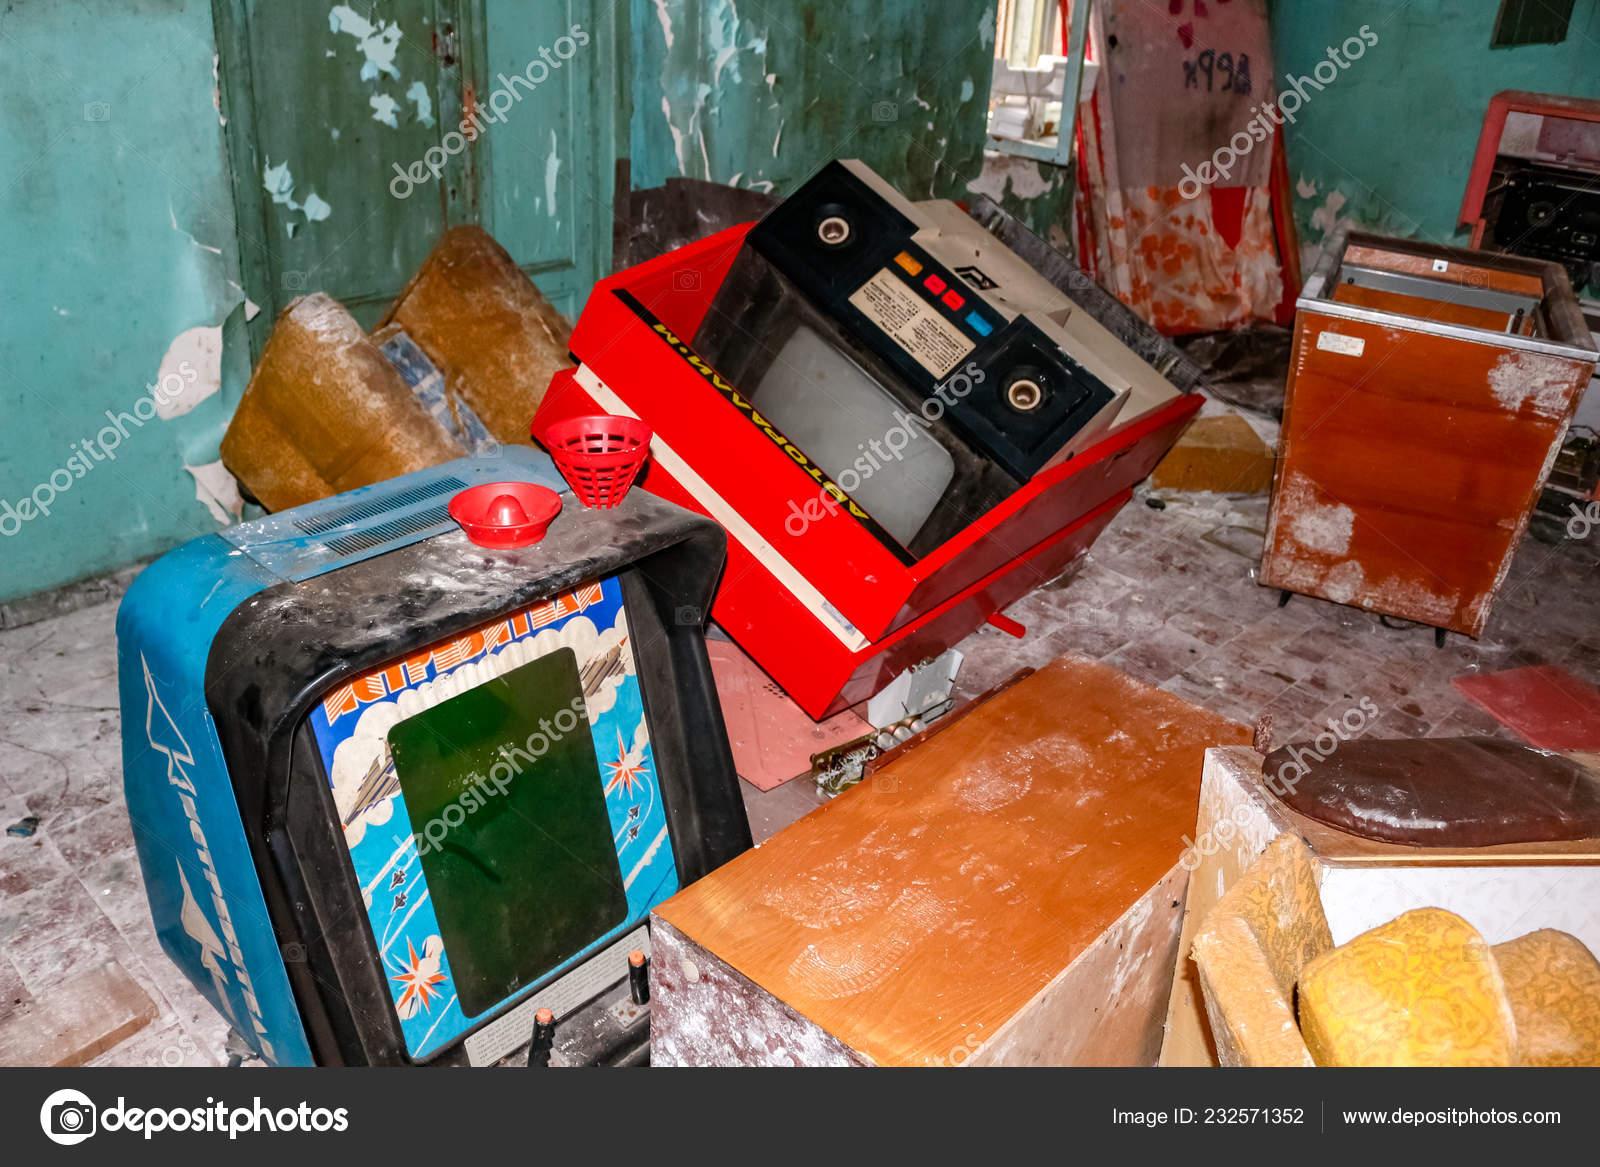 Baccarat pro series table game описание игрового автомата